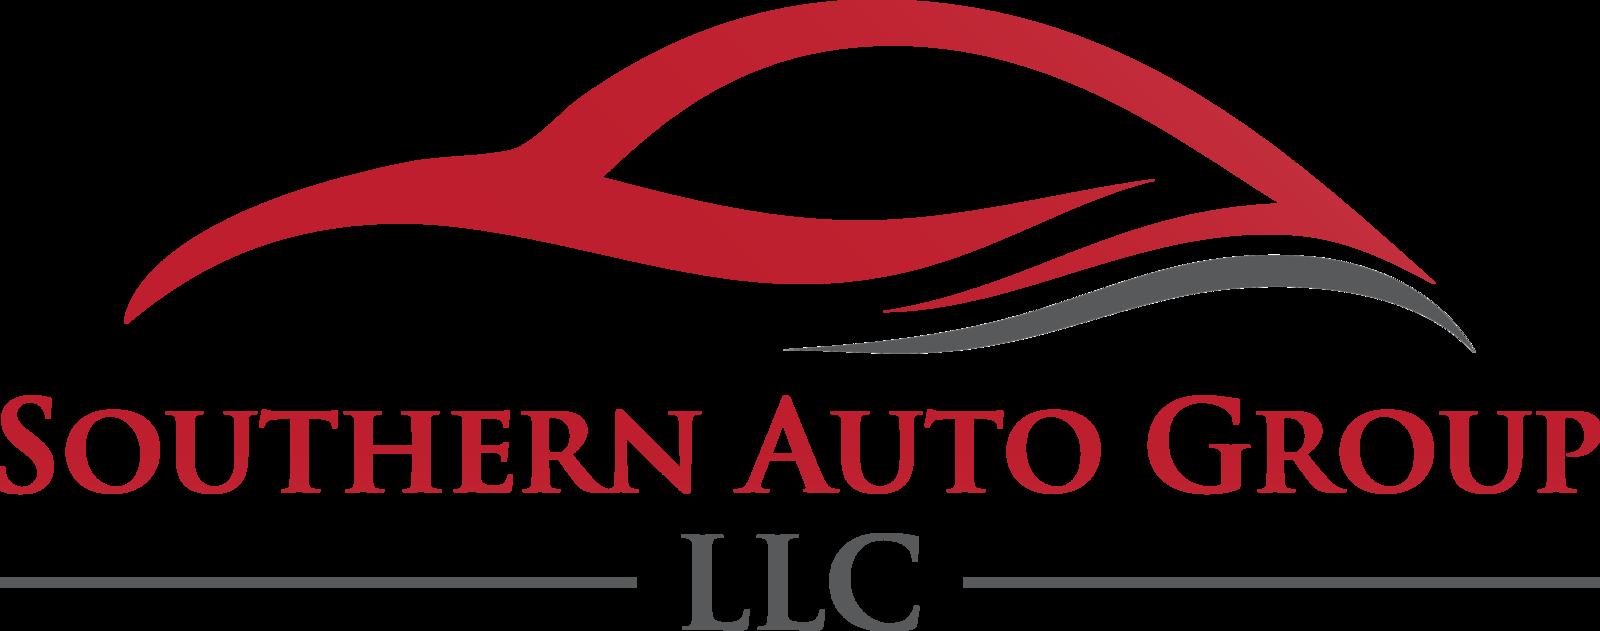 Grand Rapids Car Dealers >> Southern Auto Group LLC - Grand Rapids, MI: Read Consumer